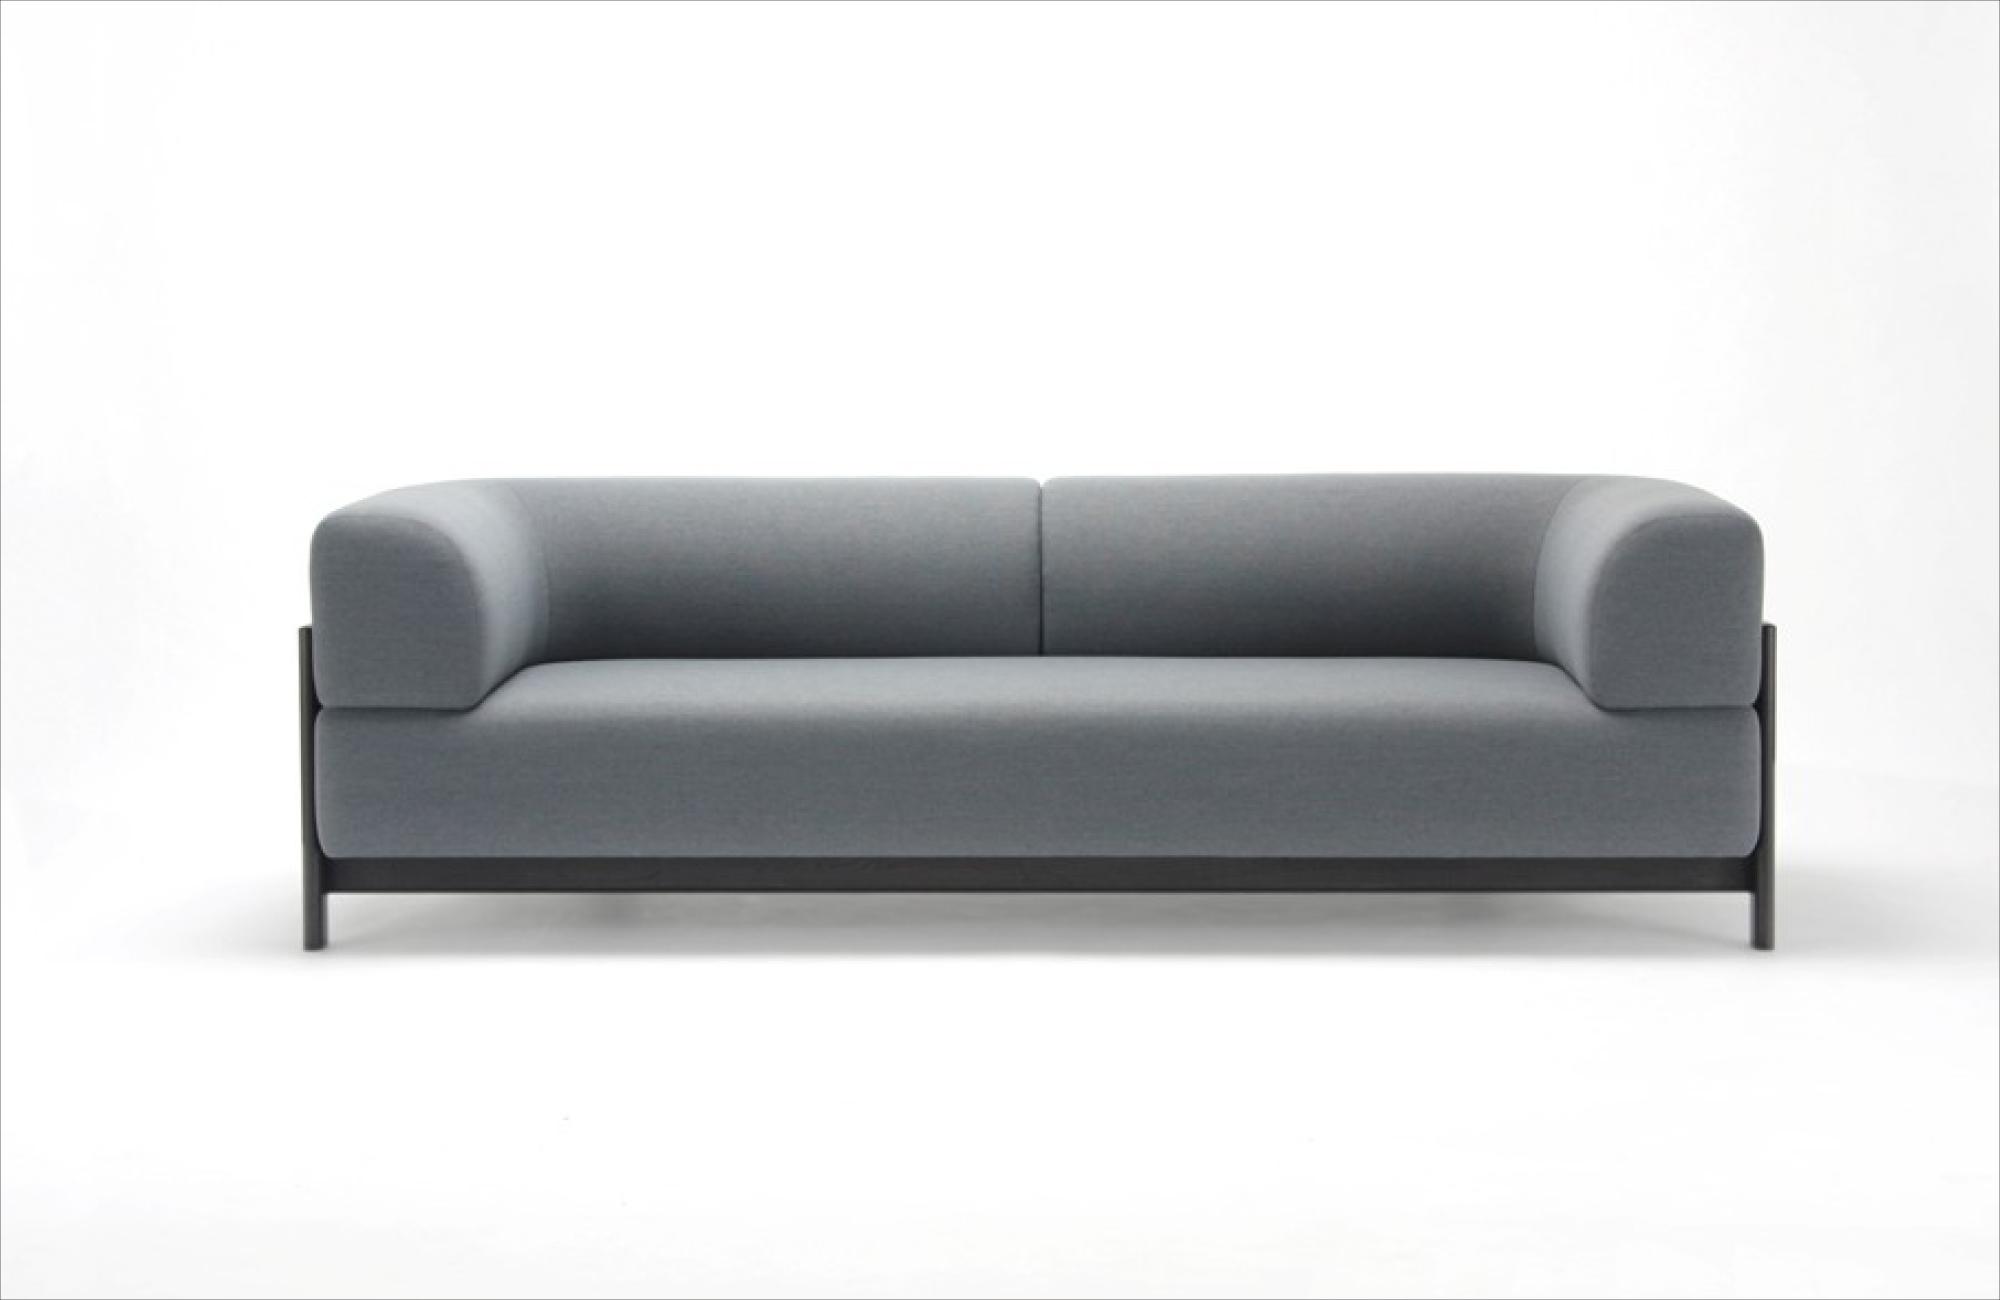 Straight sofas